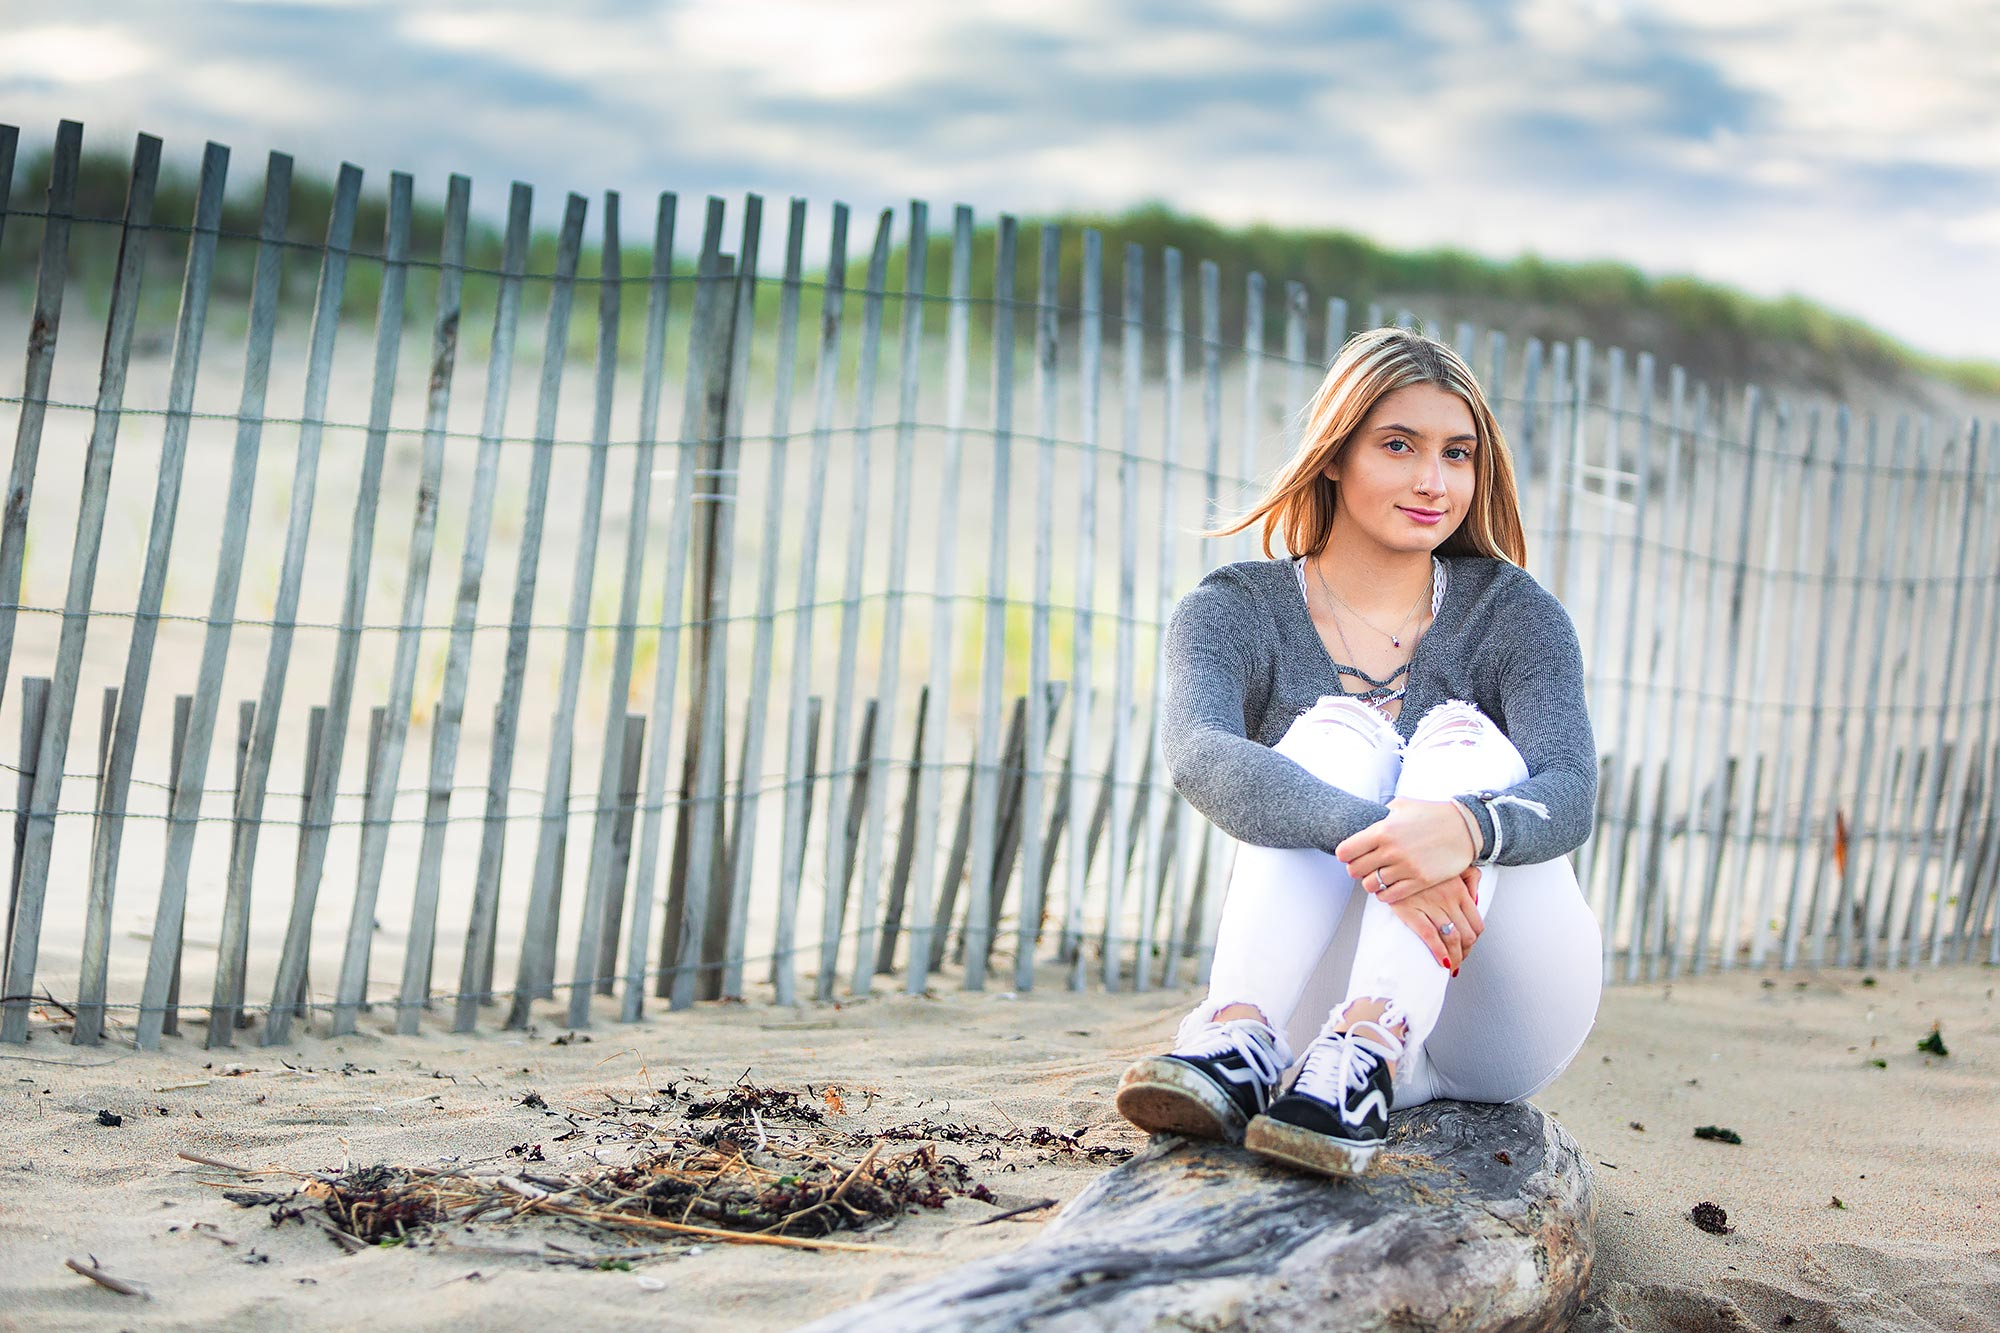 Boston Senior Portraits | Stephen Grant Photography